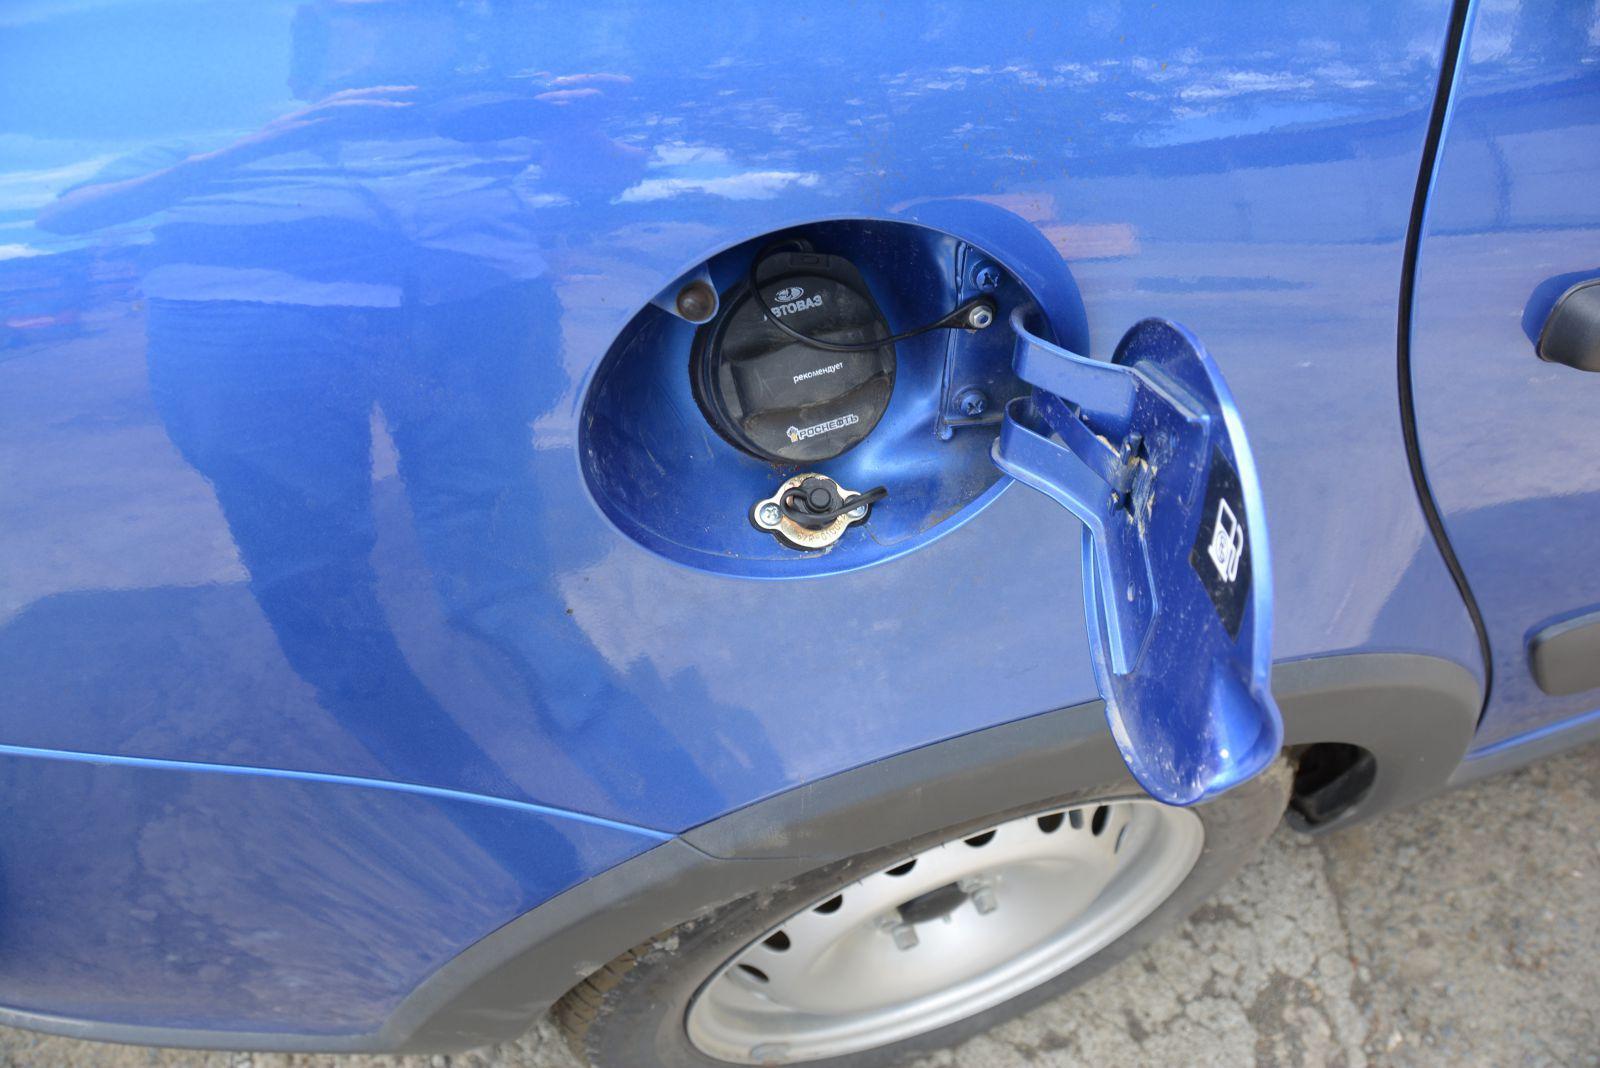 Заправочное устройство установлено в лючок бензобака